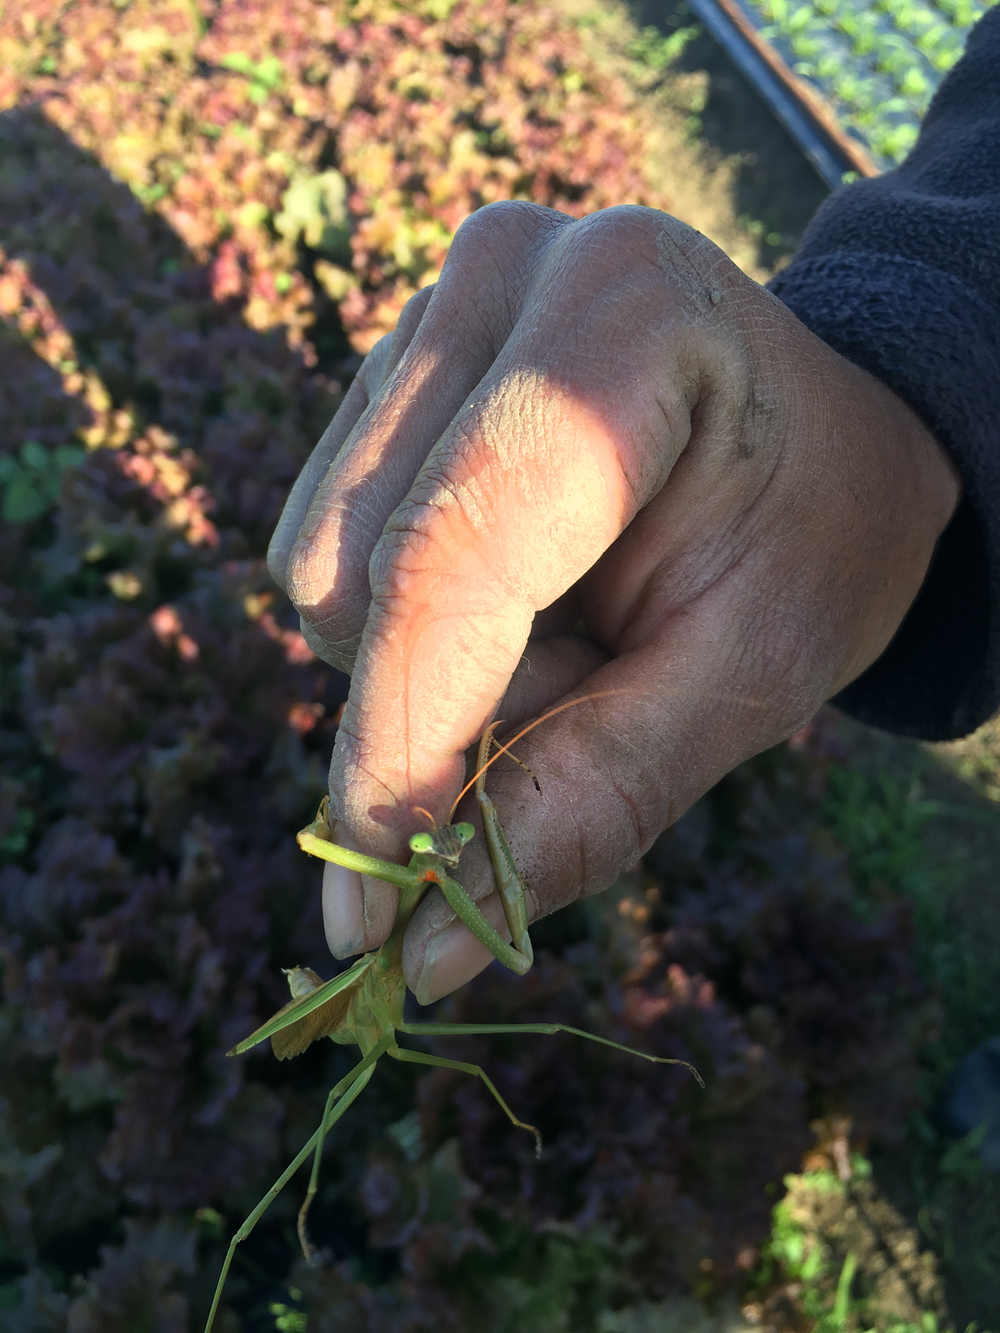 Praying Mantis in the fields